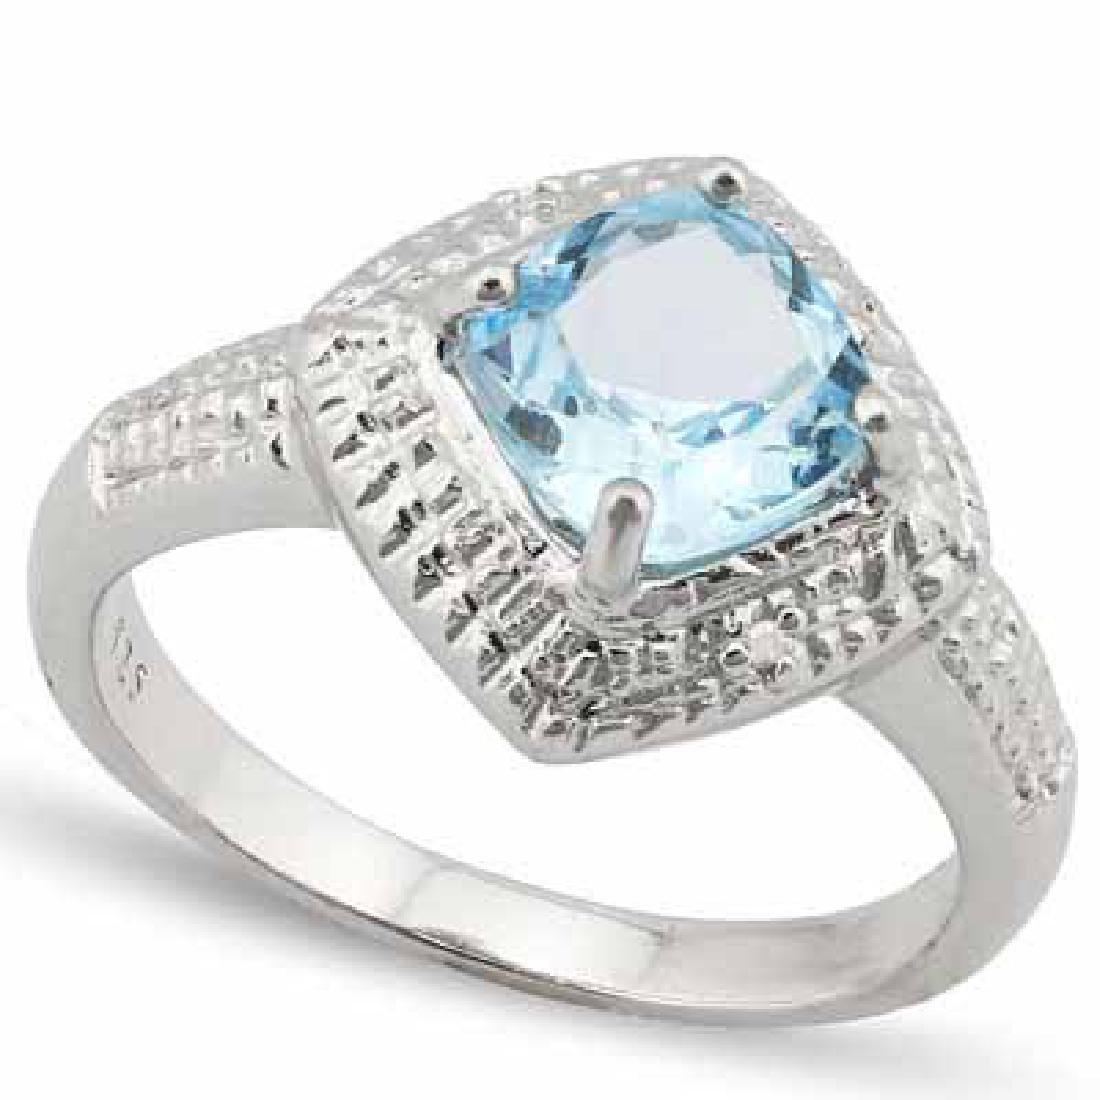 1.772 CARAT TW BLUE TOPAZ & GENUINE DIAMOND PLATINUM OV